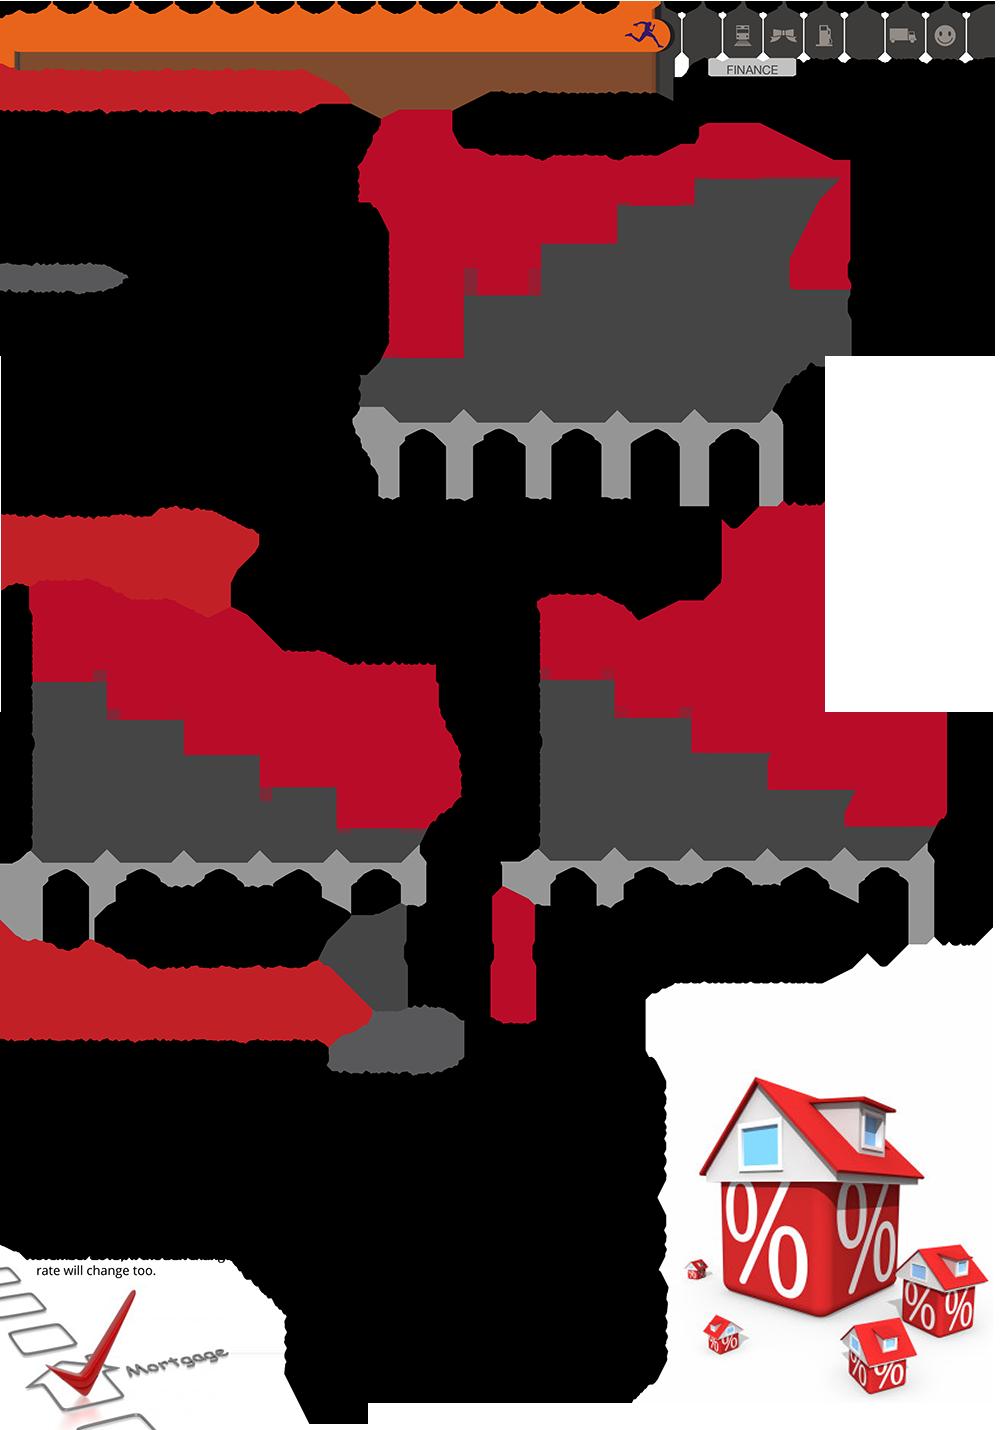 Loan Interest Rates Flat Rates Vs Fixed Rates Vs Variable Rates Loan Interest Rates Interest Rates Flat Rate